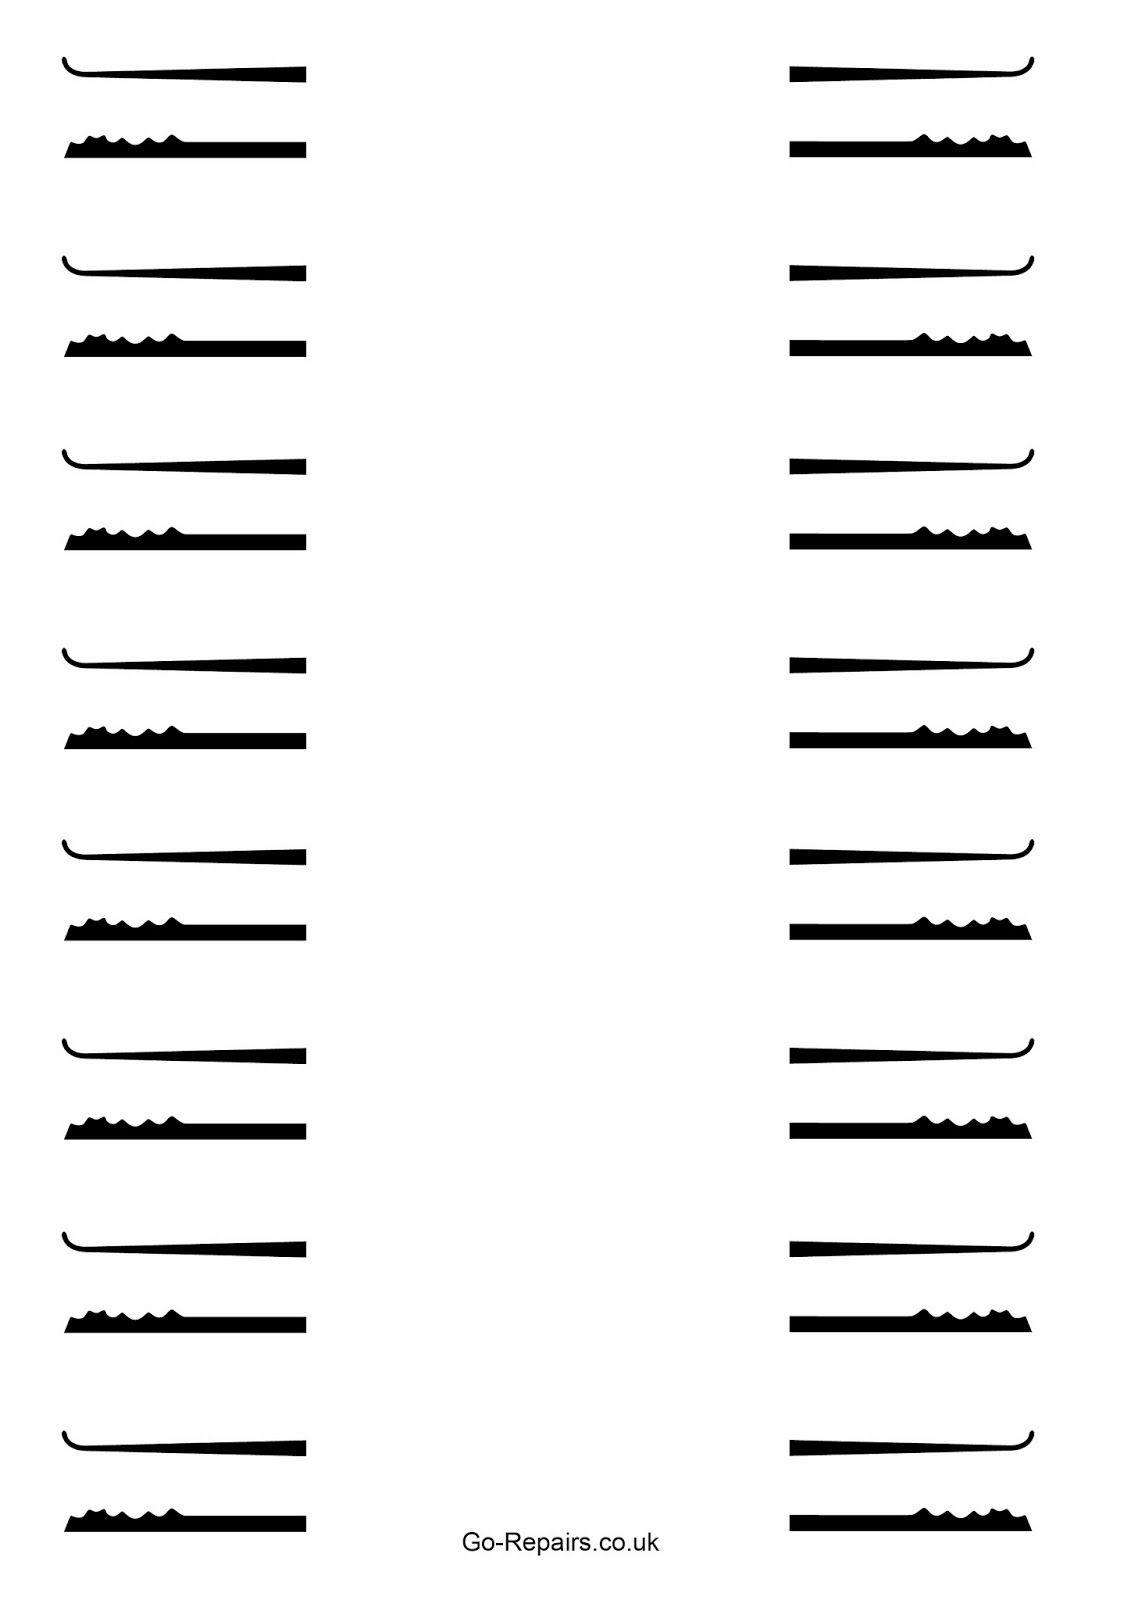 Cia Lock Pick Templates Printable | Www.topsimages - Free Printable Lock Pick Templates